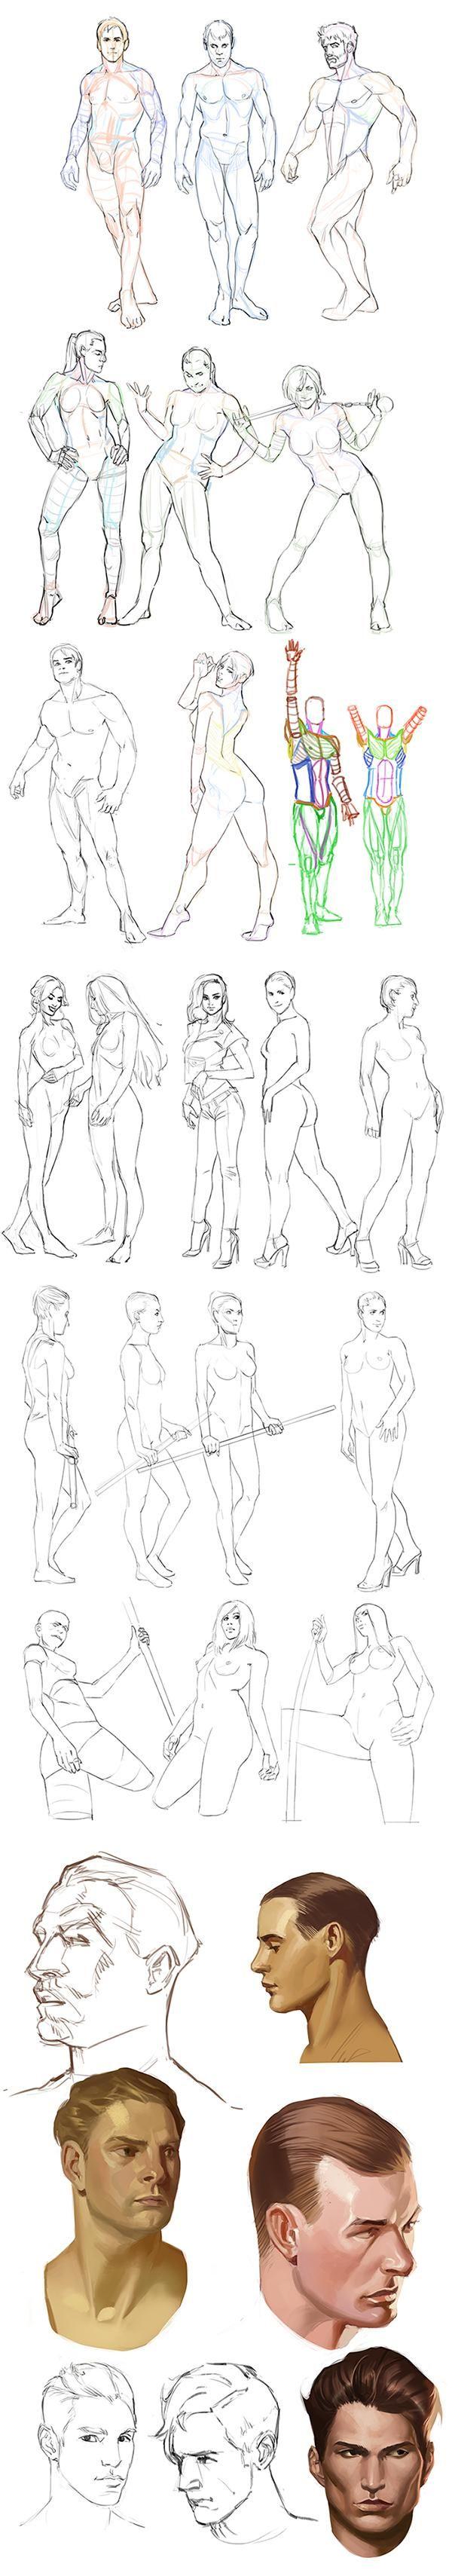 http://www.deviantart.com/journal/Anatomy-practice-555933771